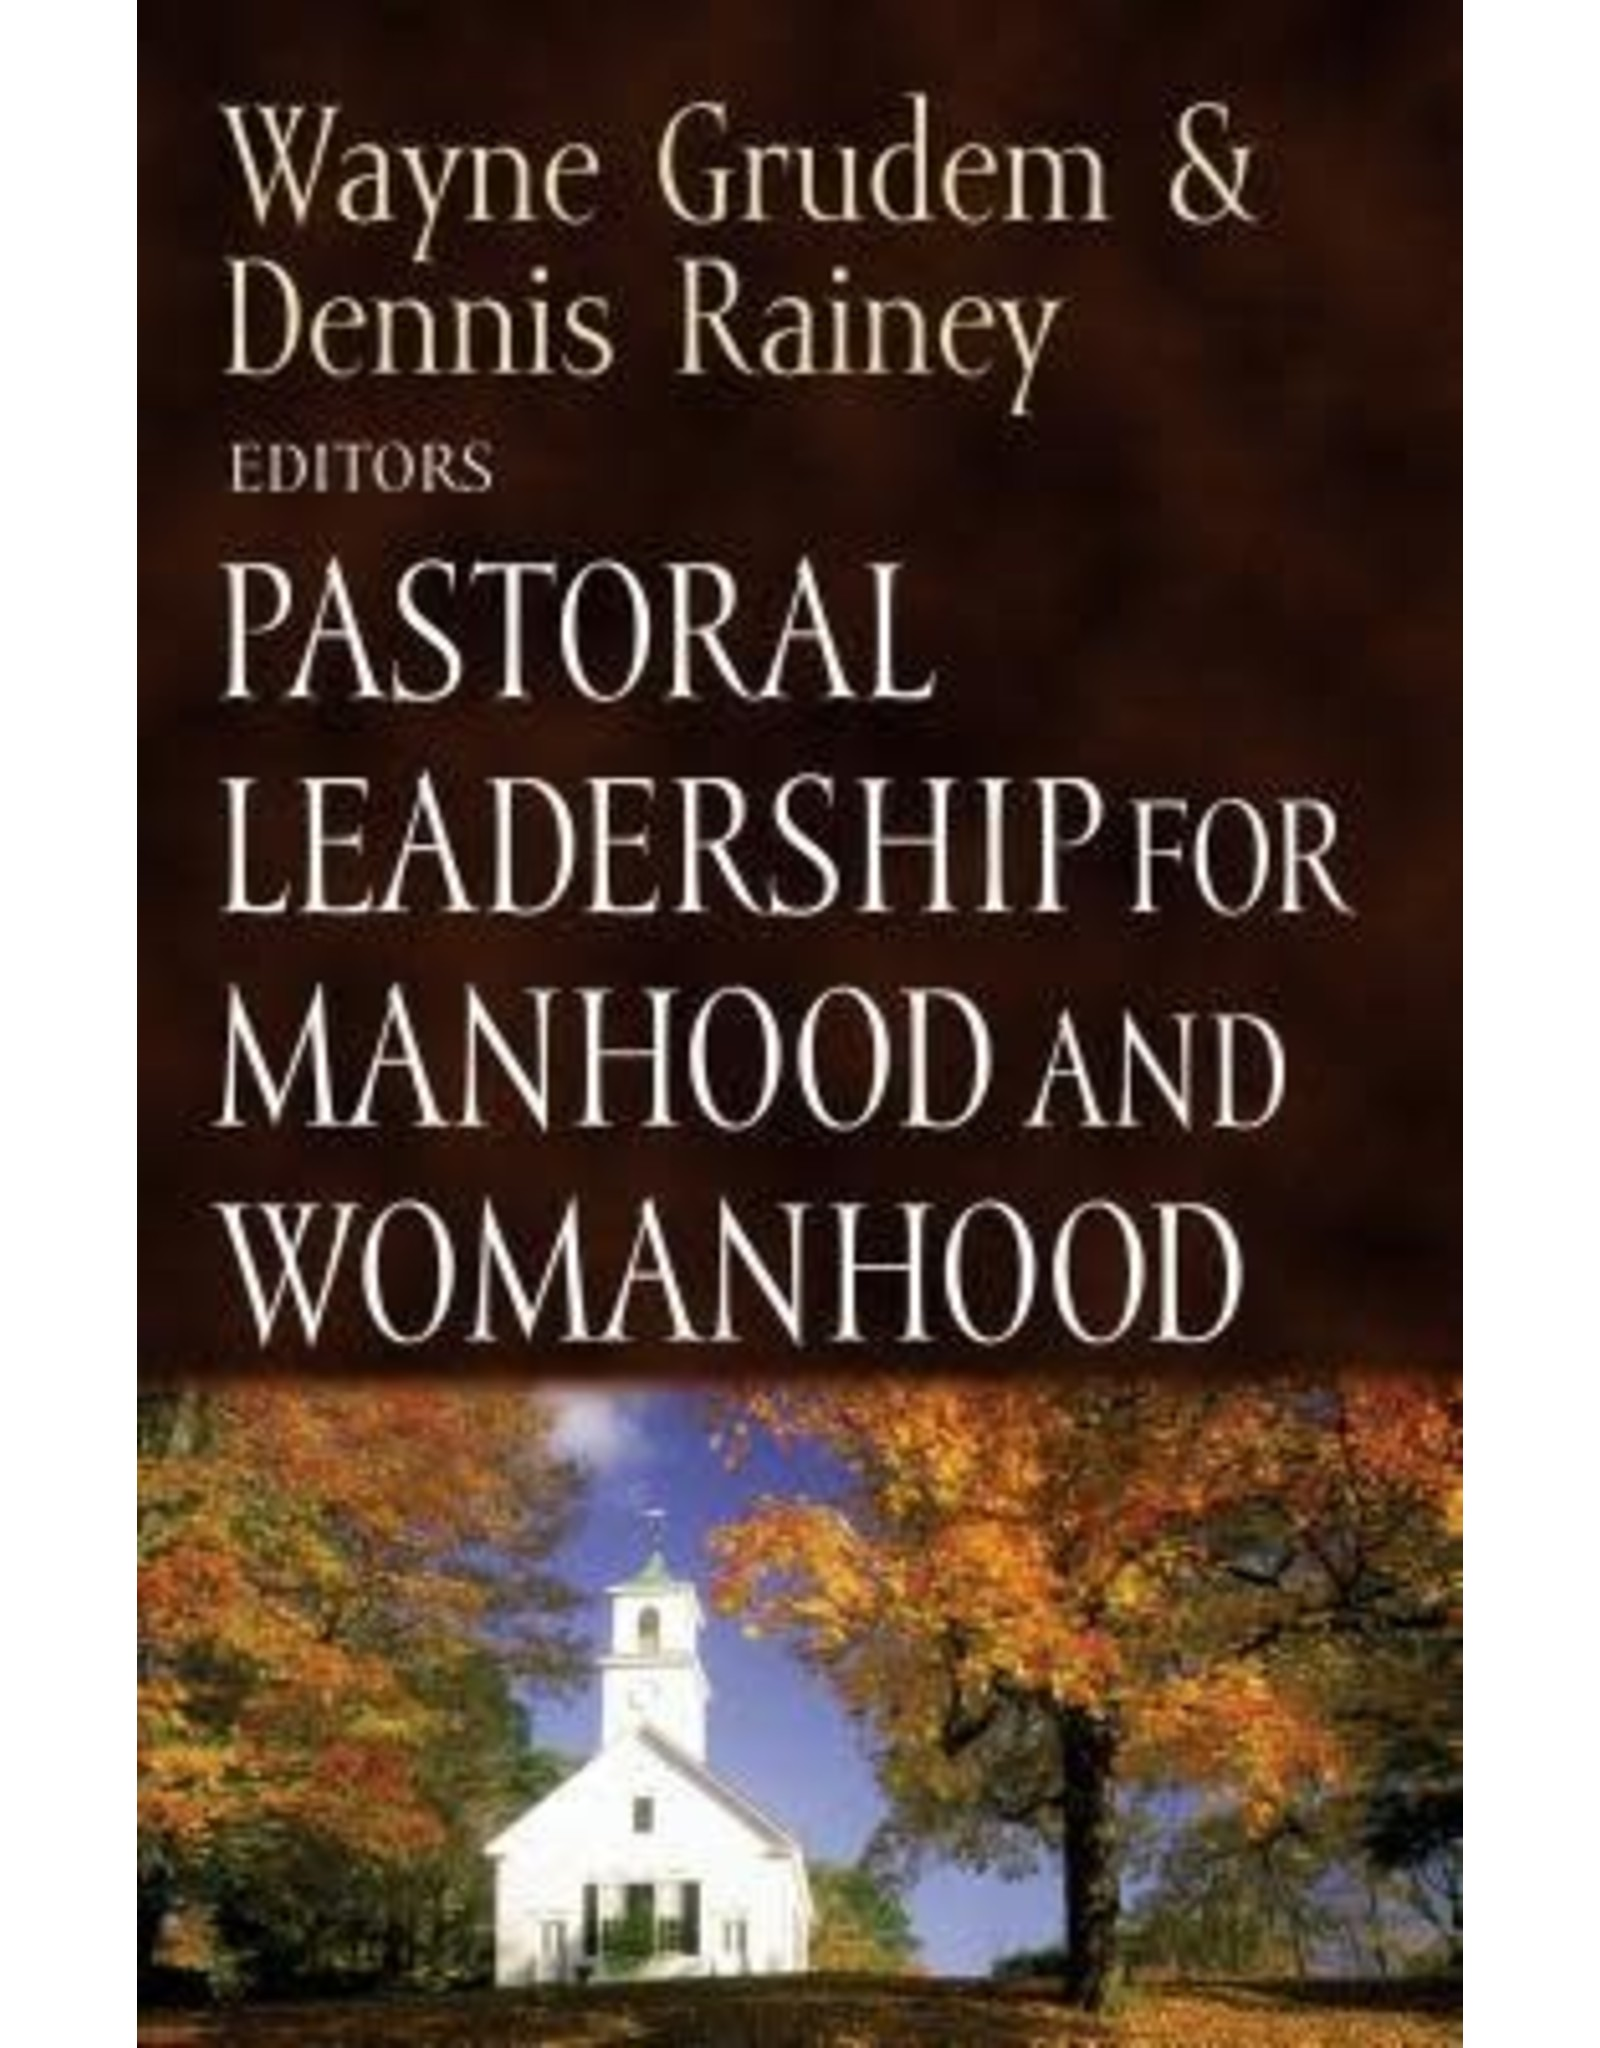 Grudem Pastoral Leadership for Manhood and Womanhood